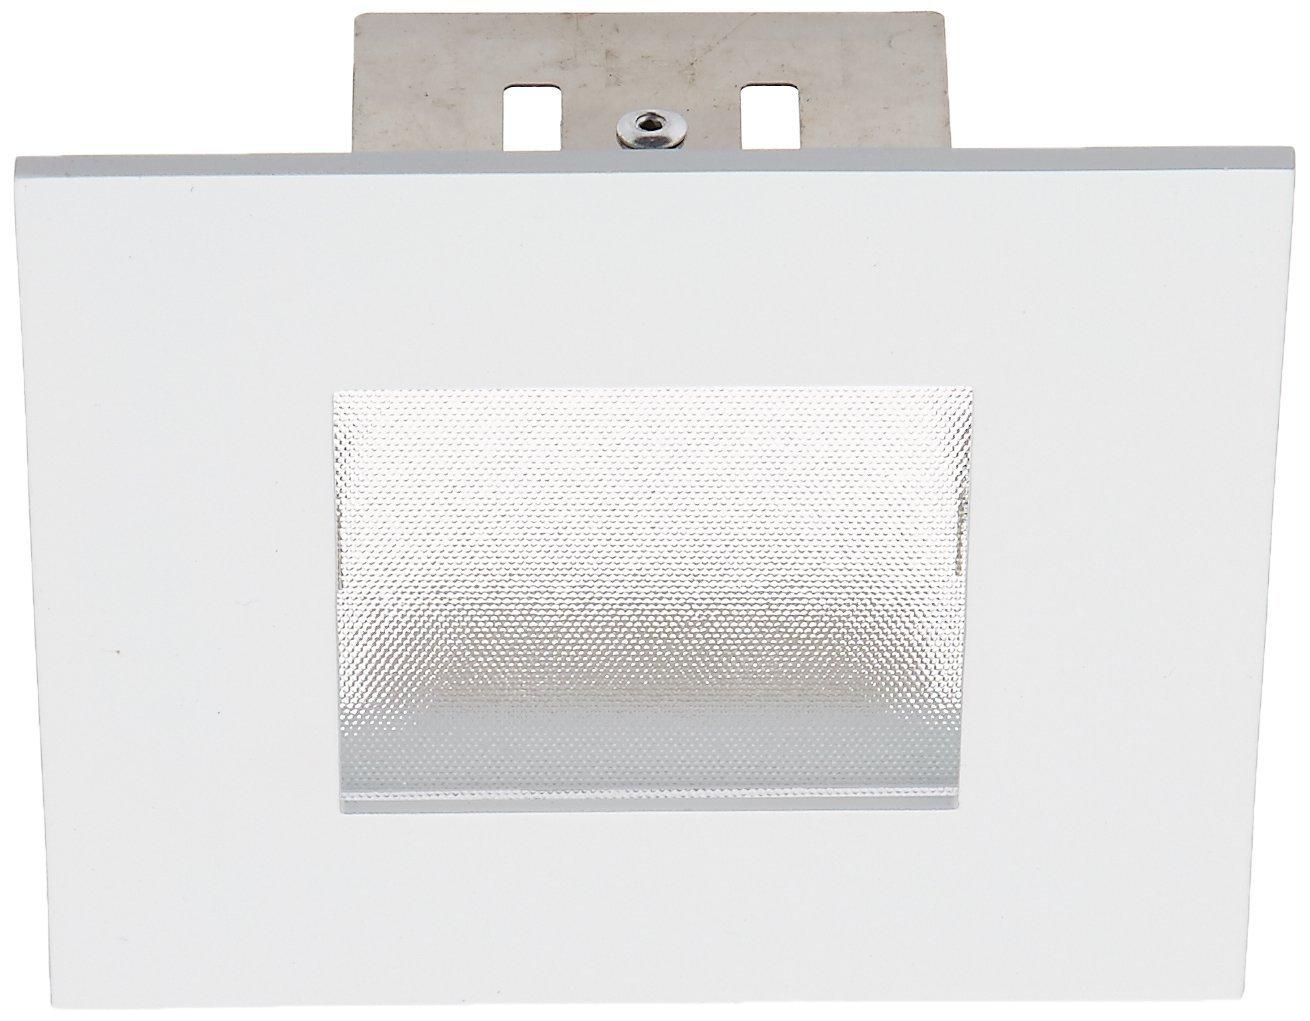 WAC Lighting HR-LED371-WT 3-Inch LED Downlight Trim Square